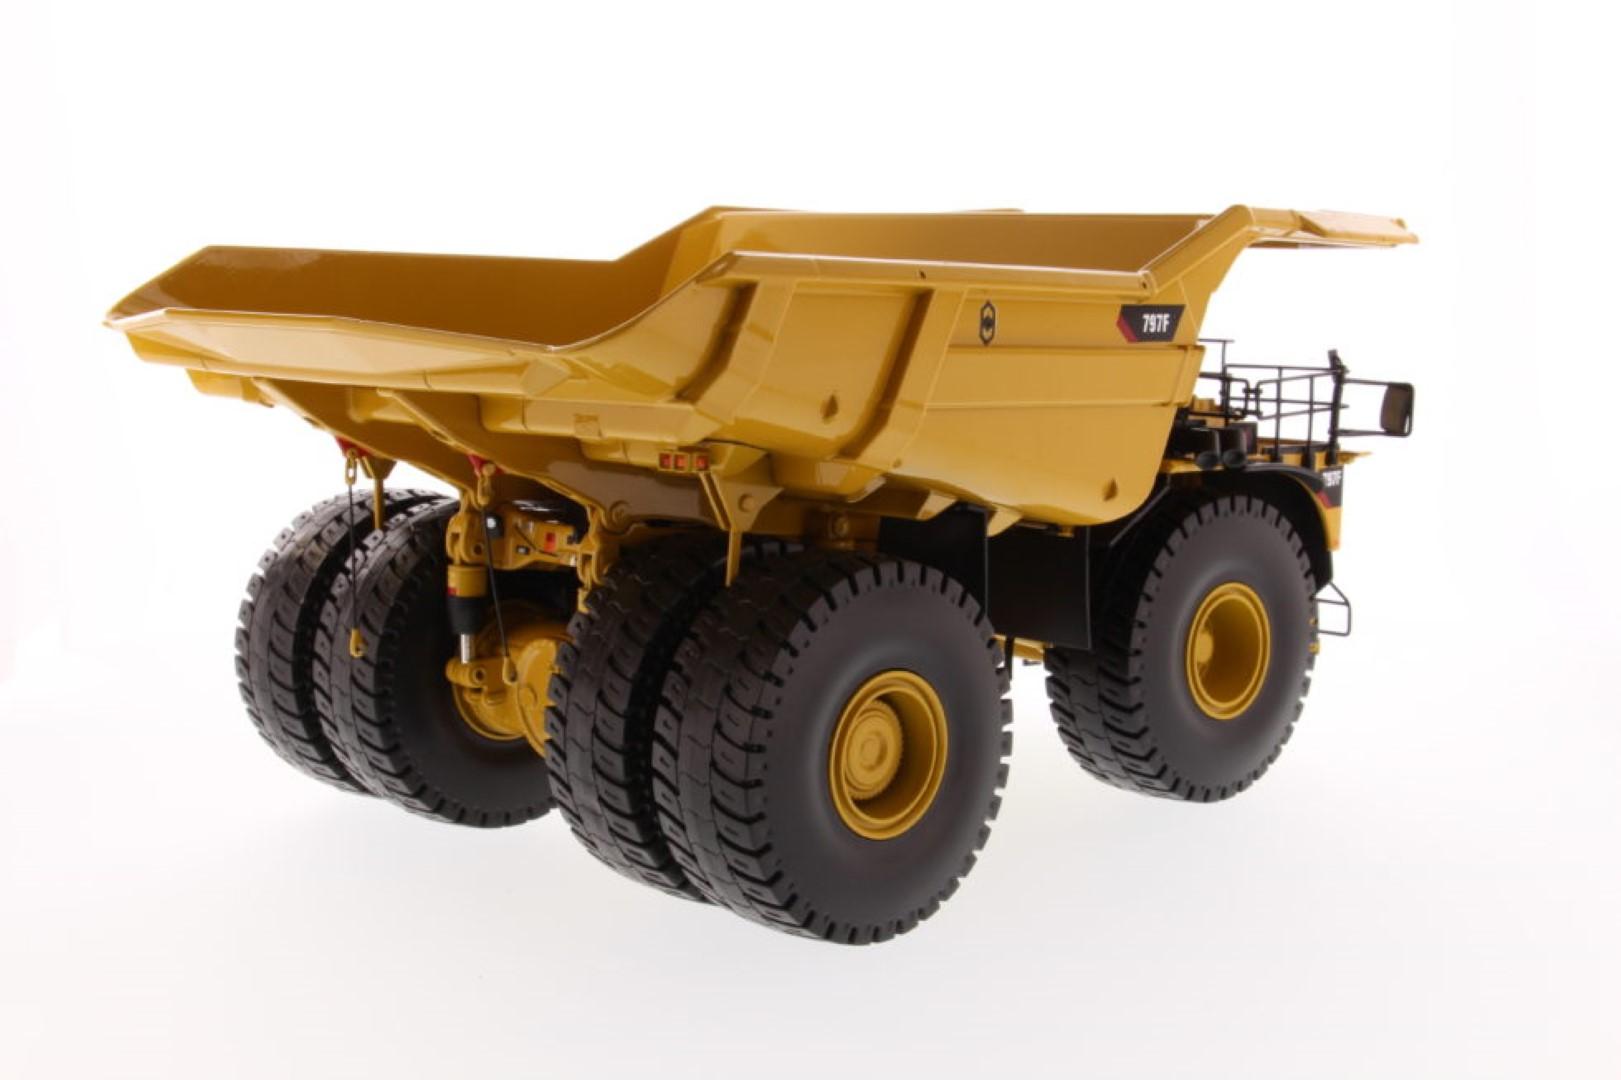 Diecast Masters CAT 797F Tier 4 Mining Truck - Image 4 of 5